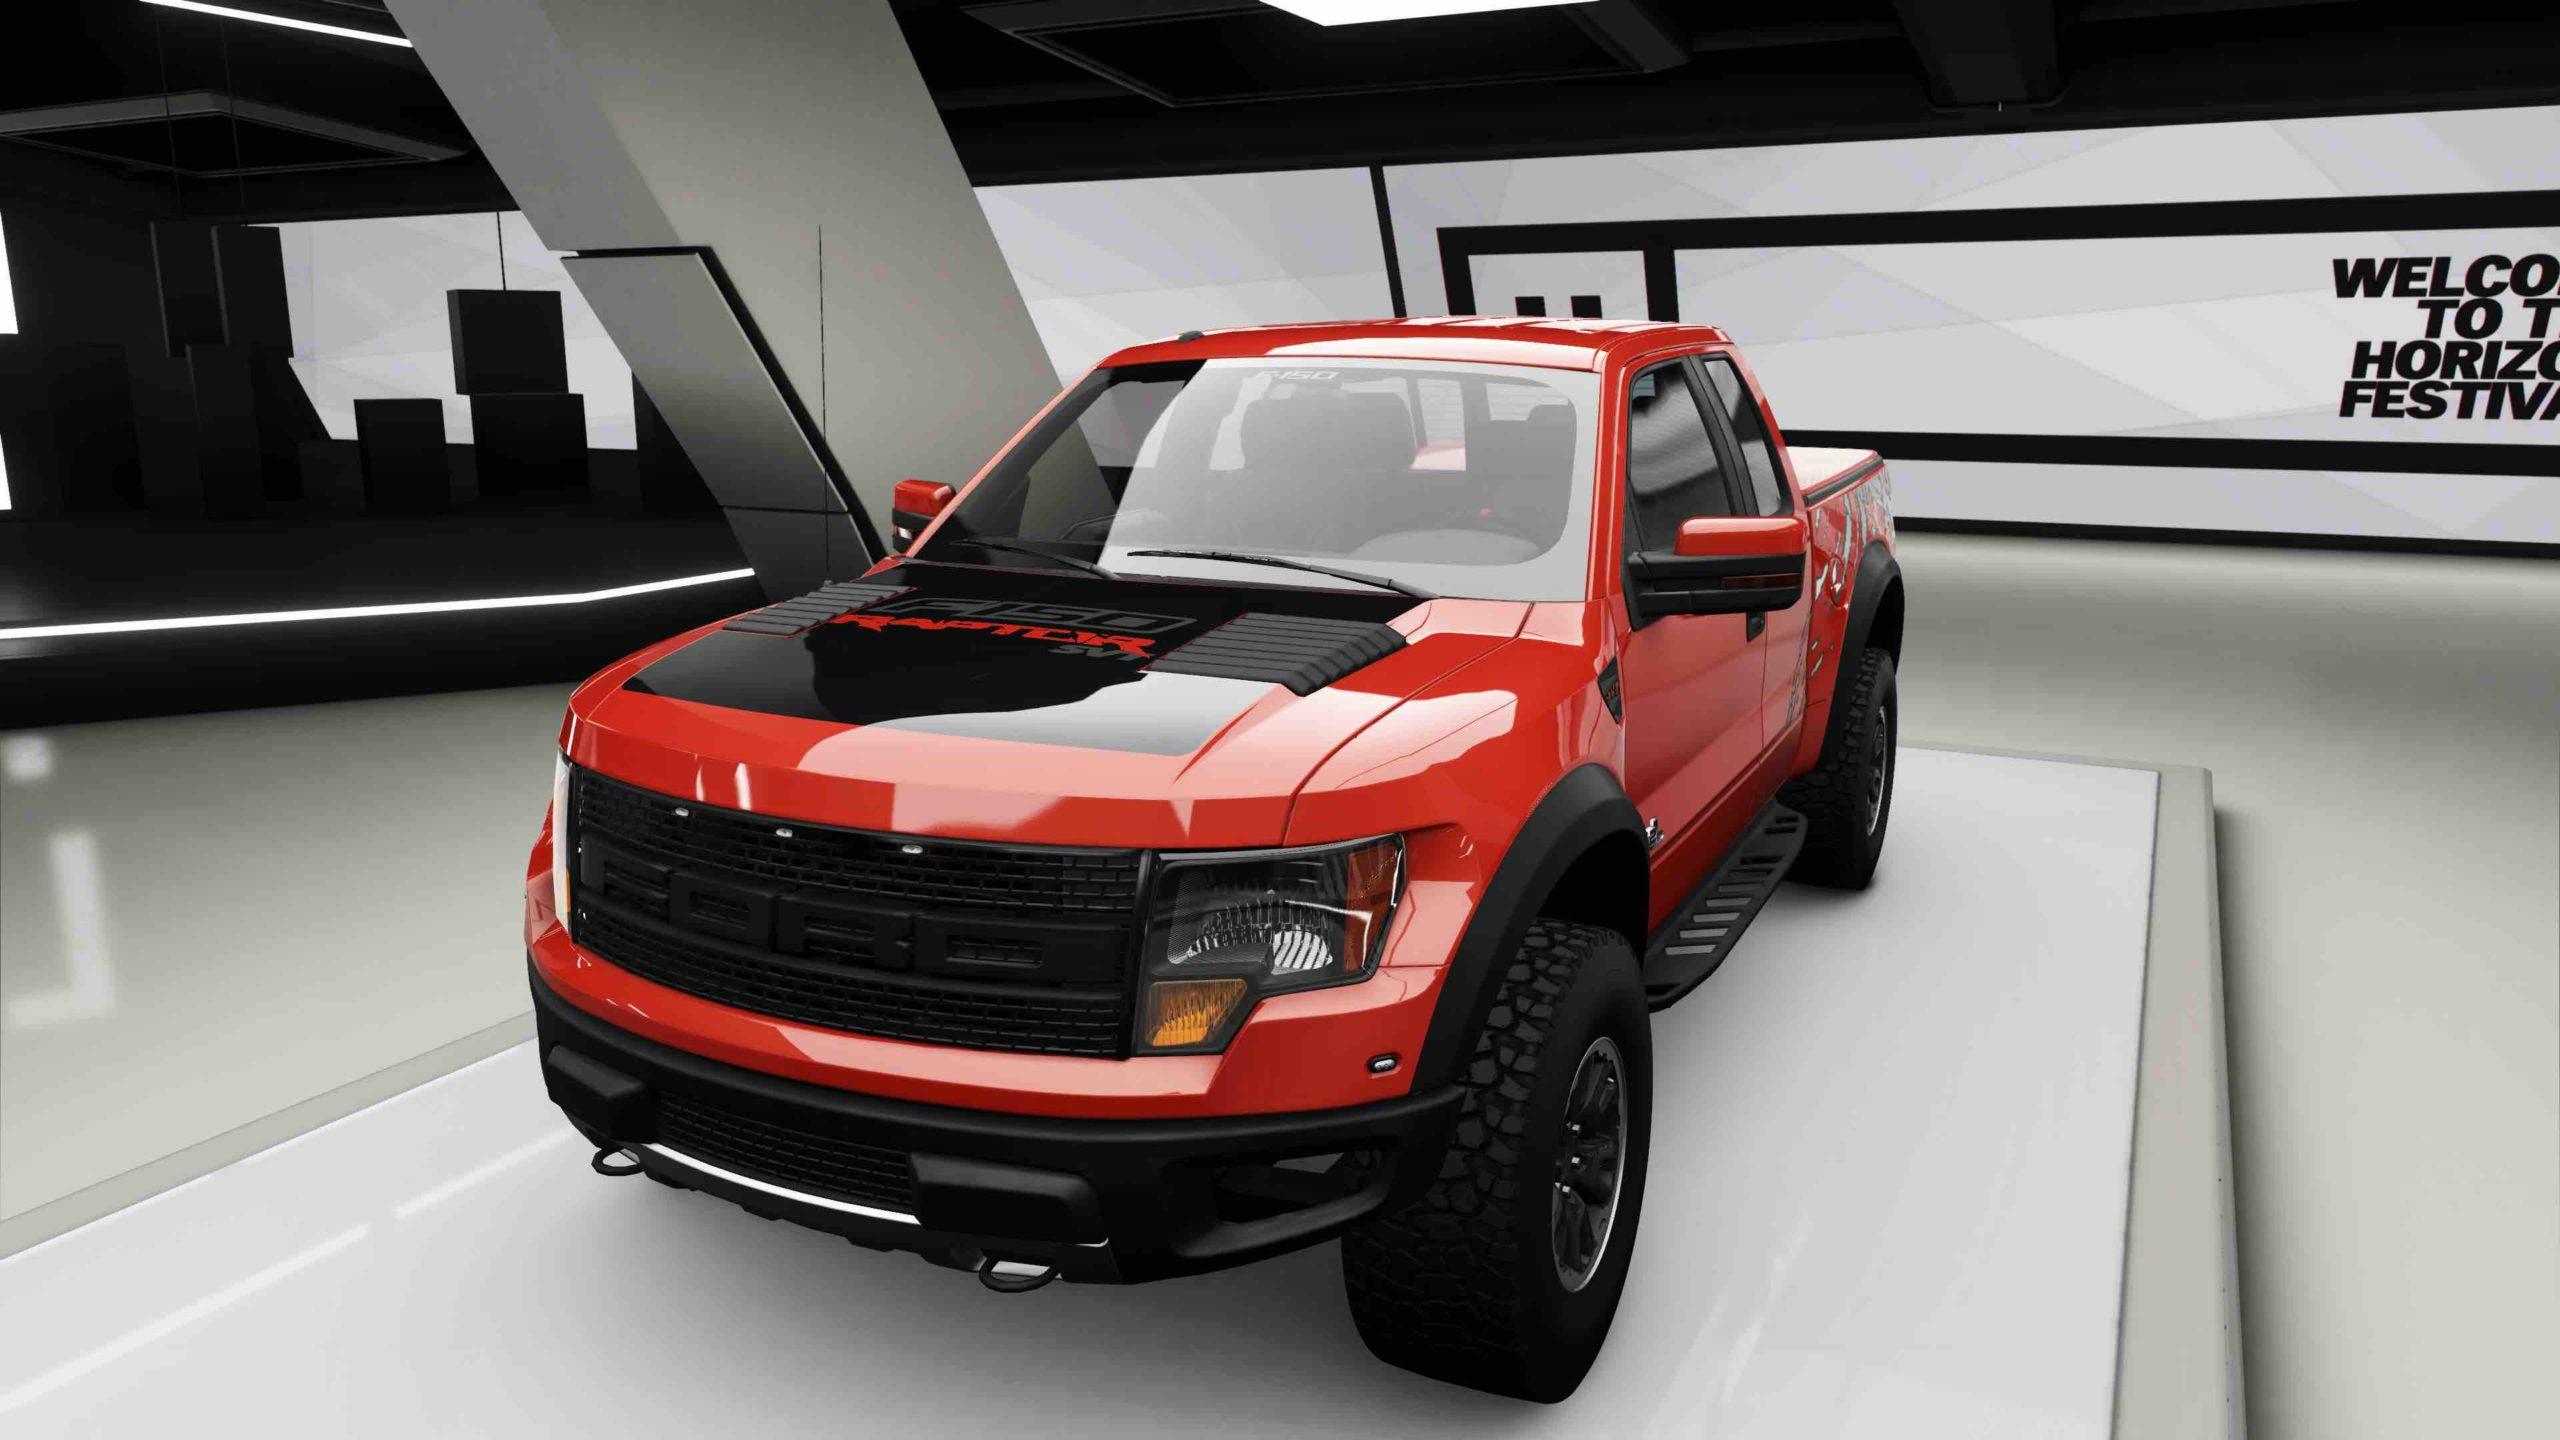 Forza-Horizon-4-Ford-F-150-SVT-Raptor-2011